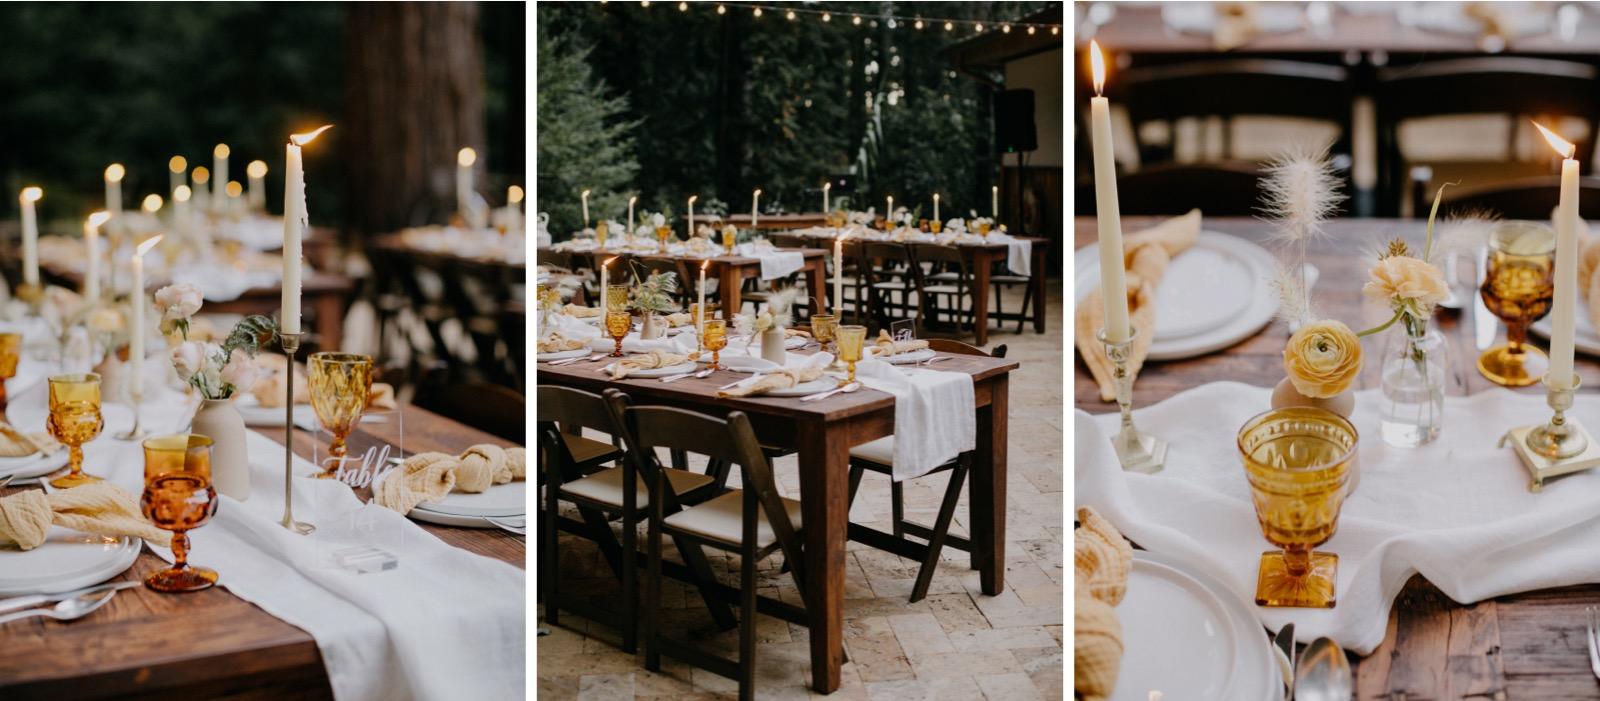 107_Emily & Jeff Wedding 0936_Emily & Jeff Wedding 0948_Emily & Jeff Wedding 0935_the-waterfall-lodge_forest_wedding_ben-lomond_intimate